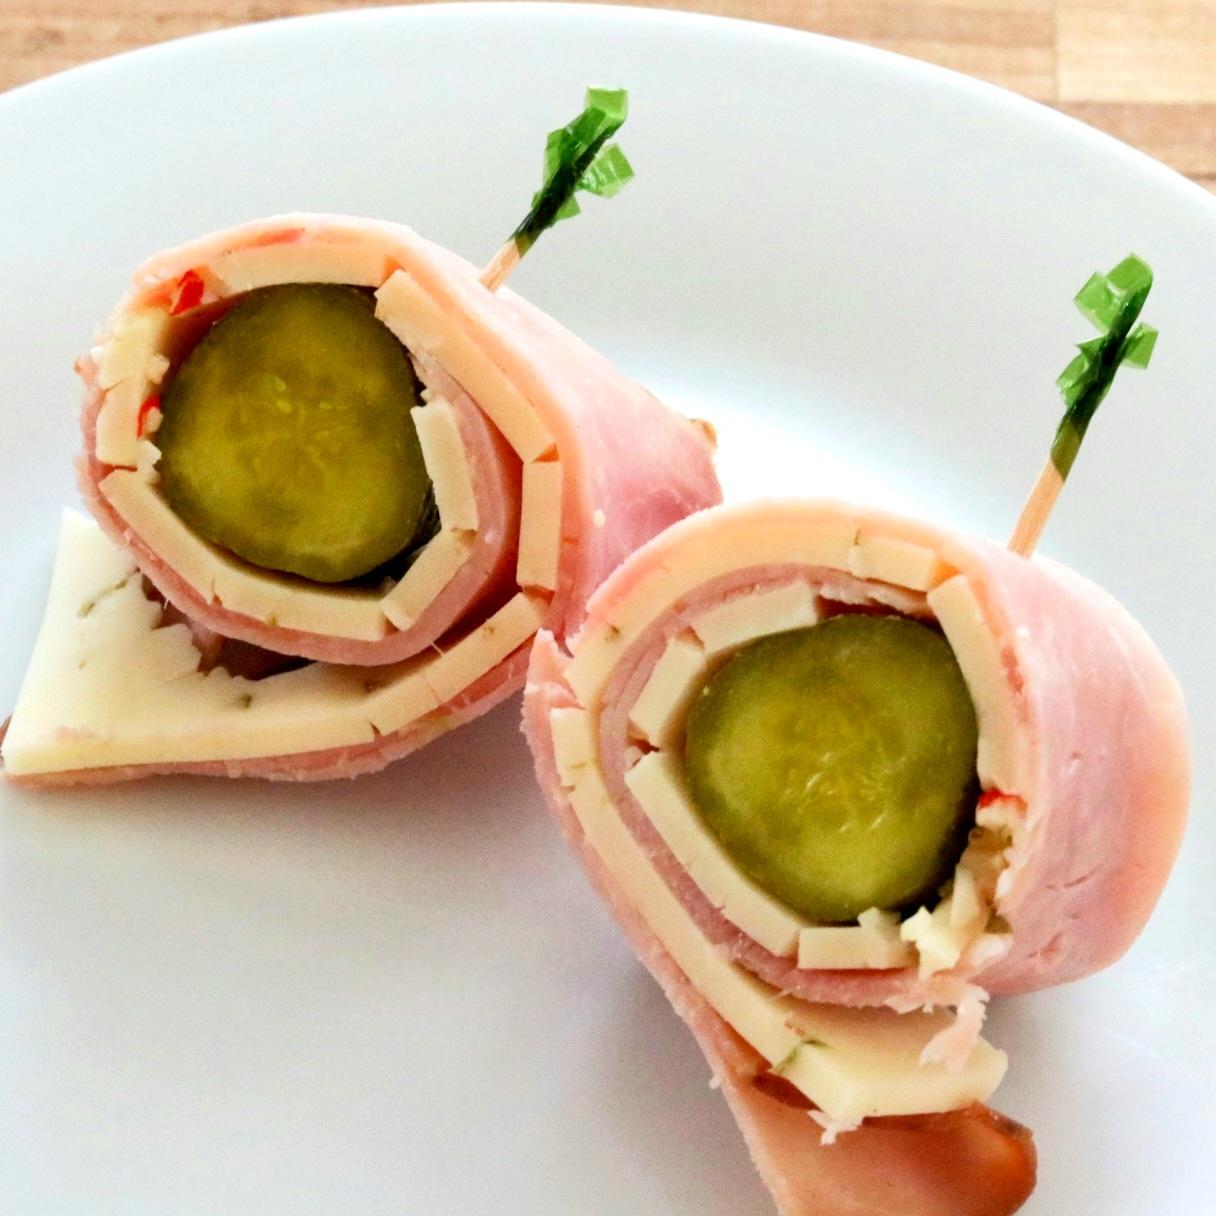 pickle+roll+up.jpg